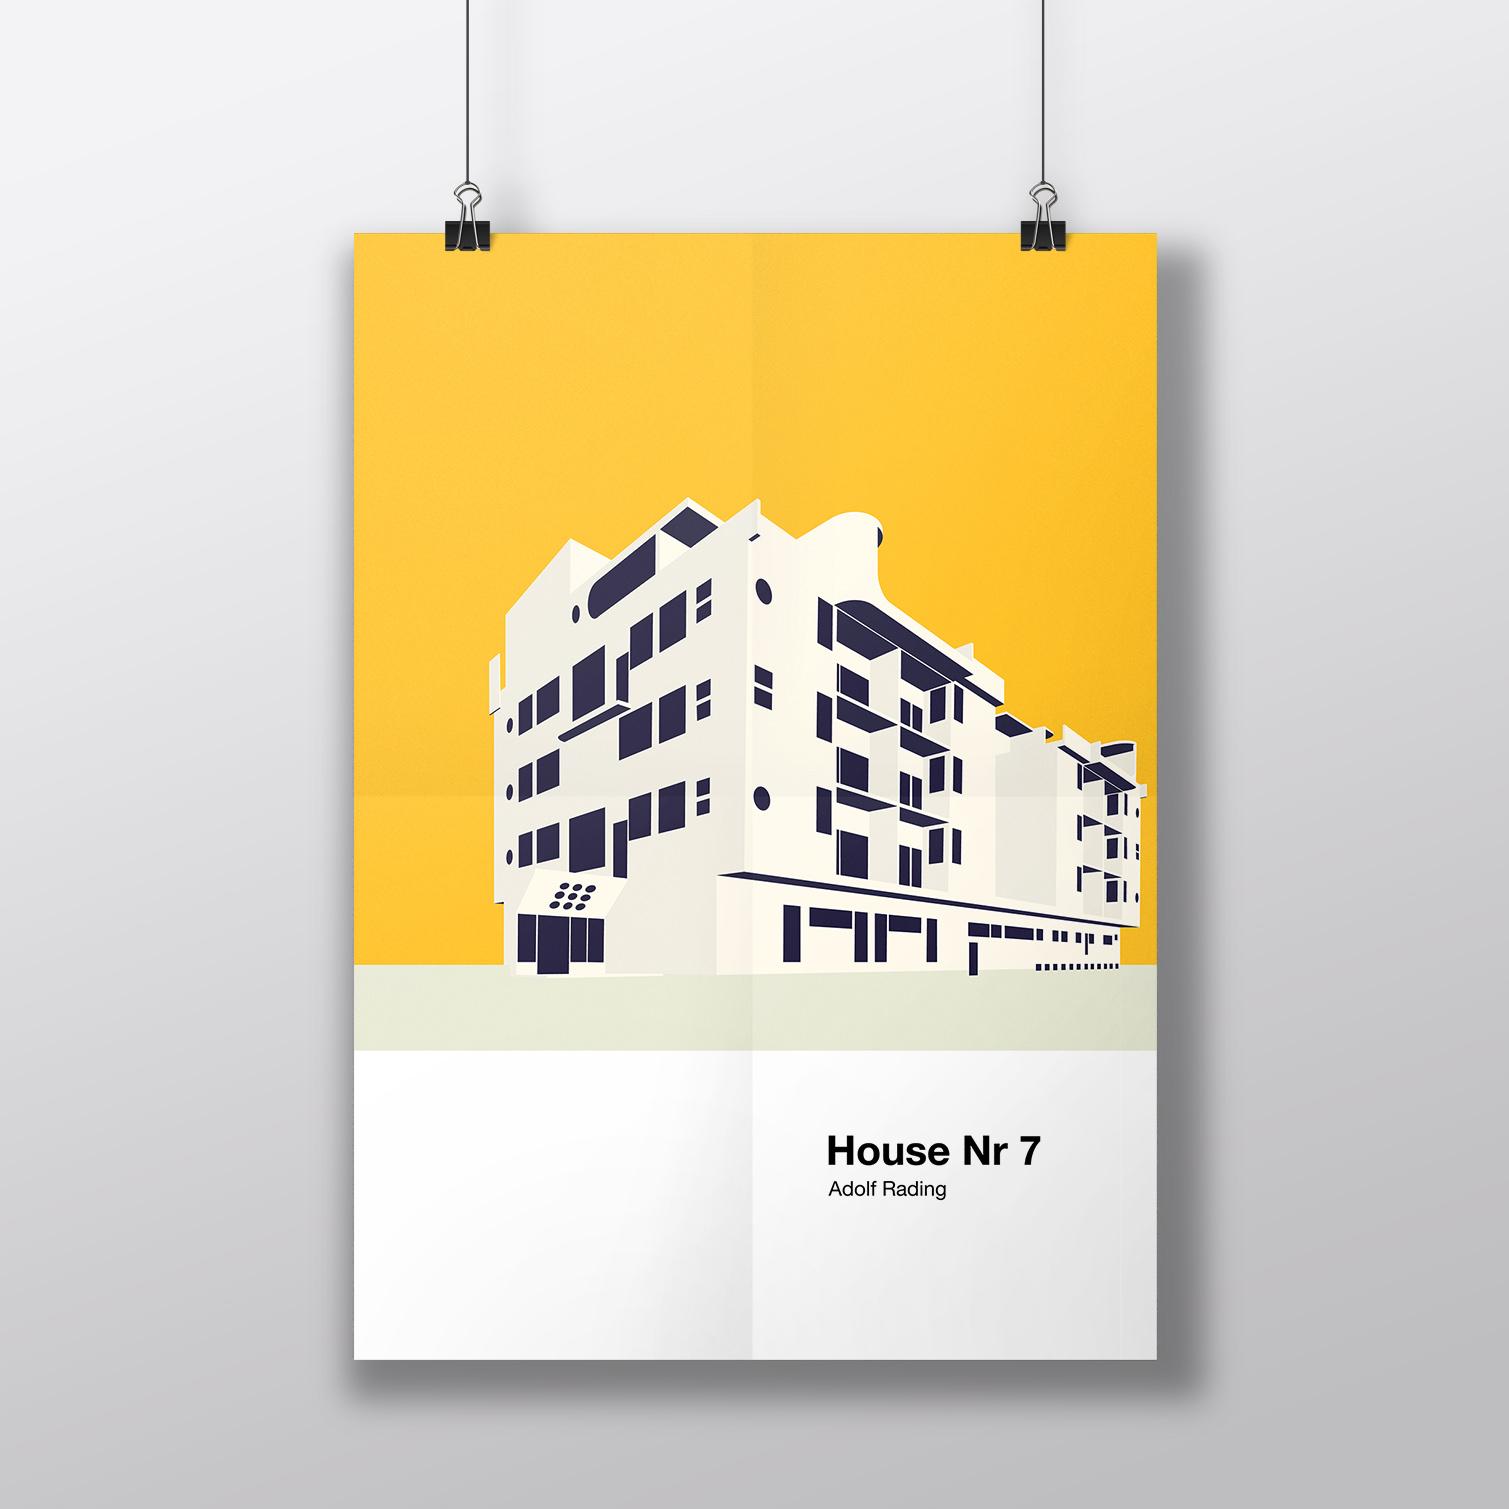 arch_it piotr zybura architecture poster wuwa wroclaw house 7